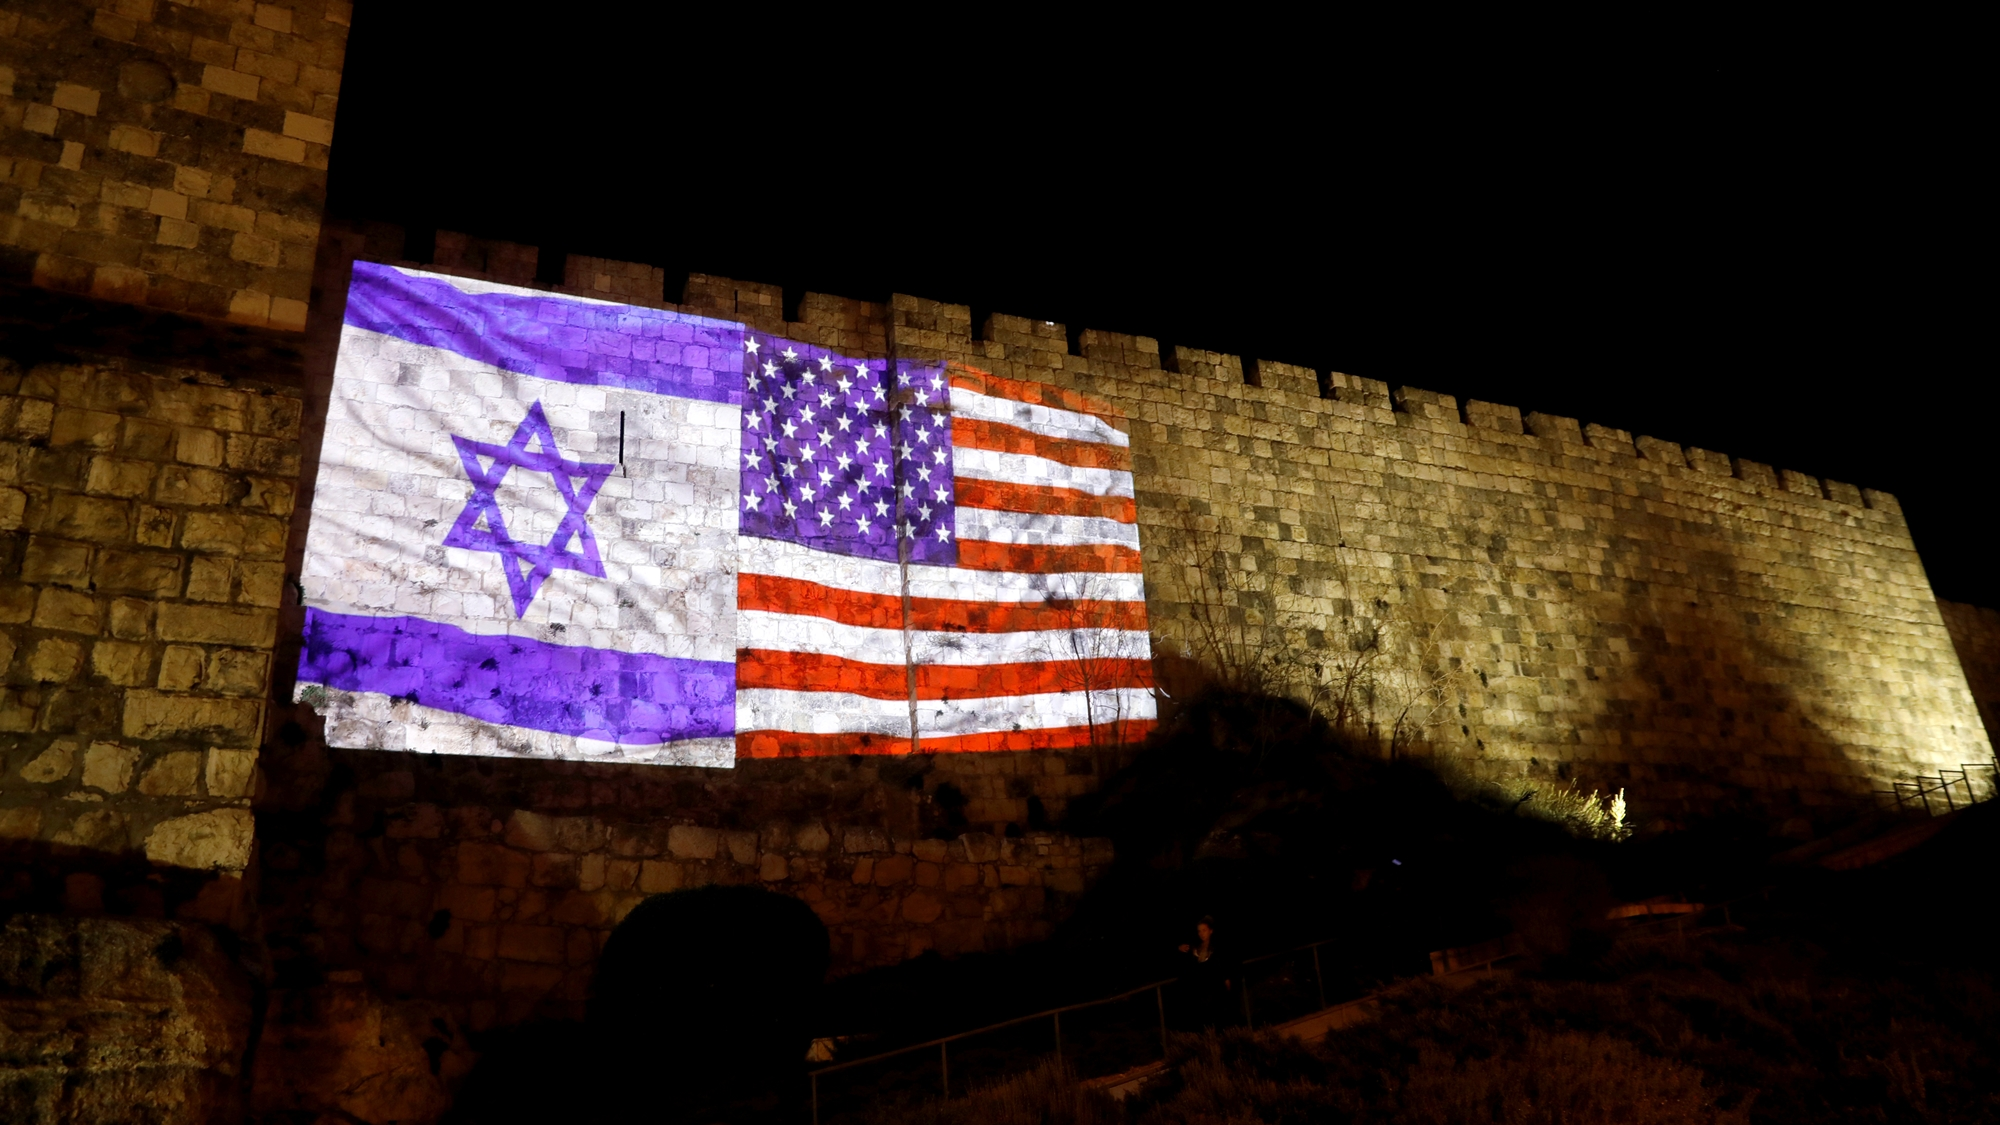 EU trasladará embajada a Jerusalén a fines de 2019